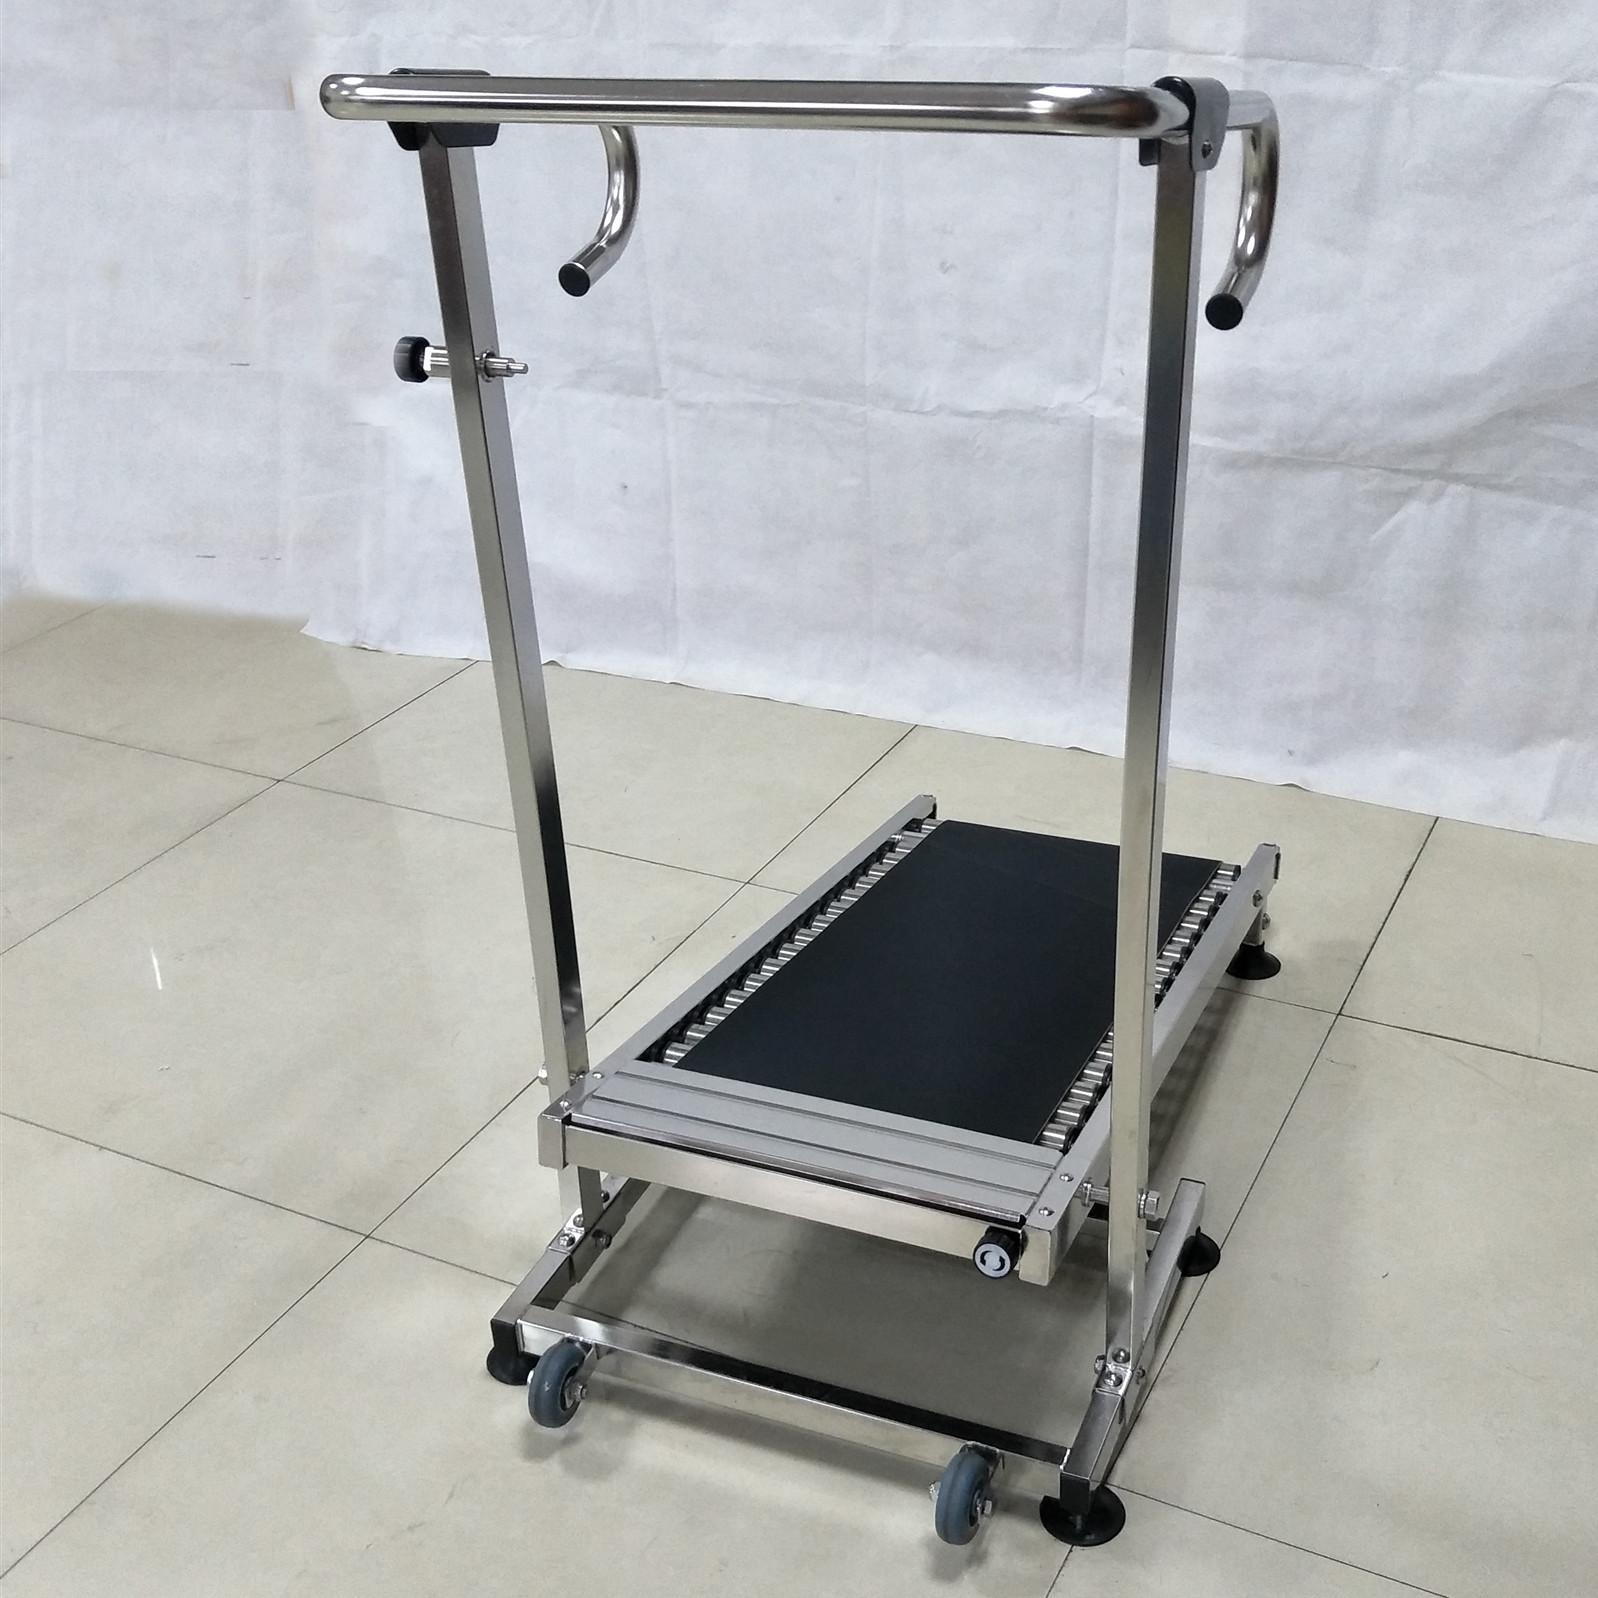 Pool cardio exercise used Underwater Stainless steel 304 Aquatic Training Treadmill